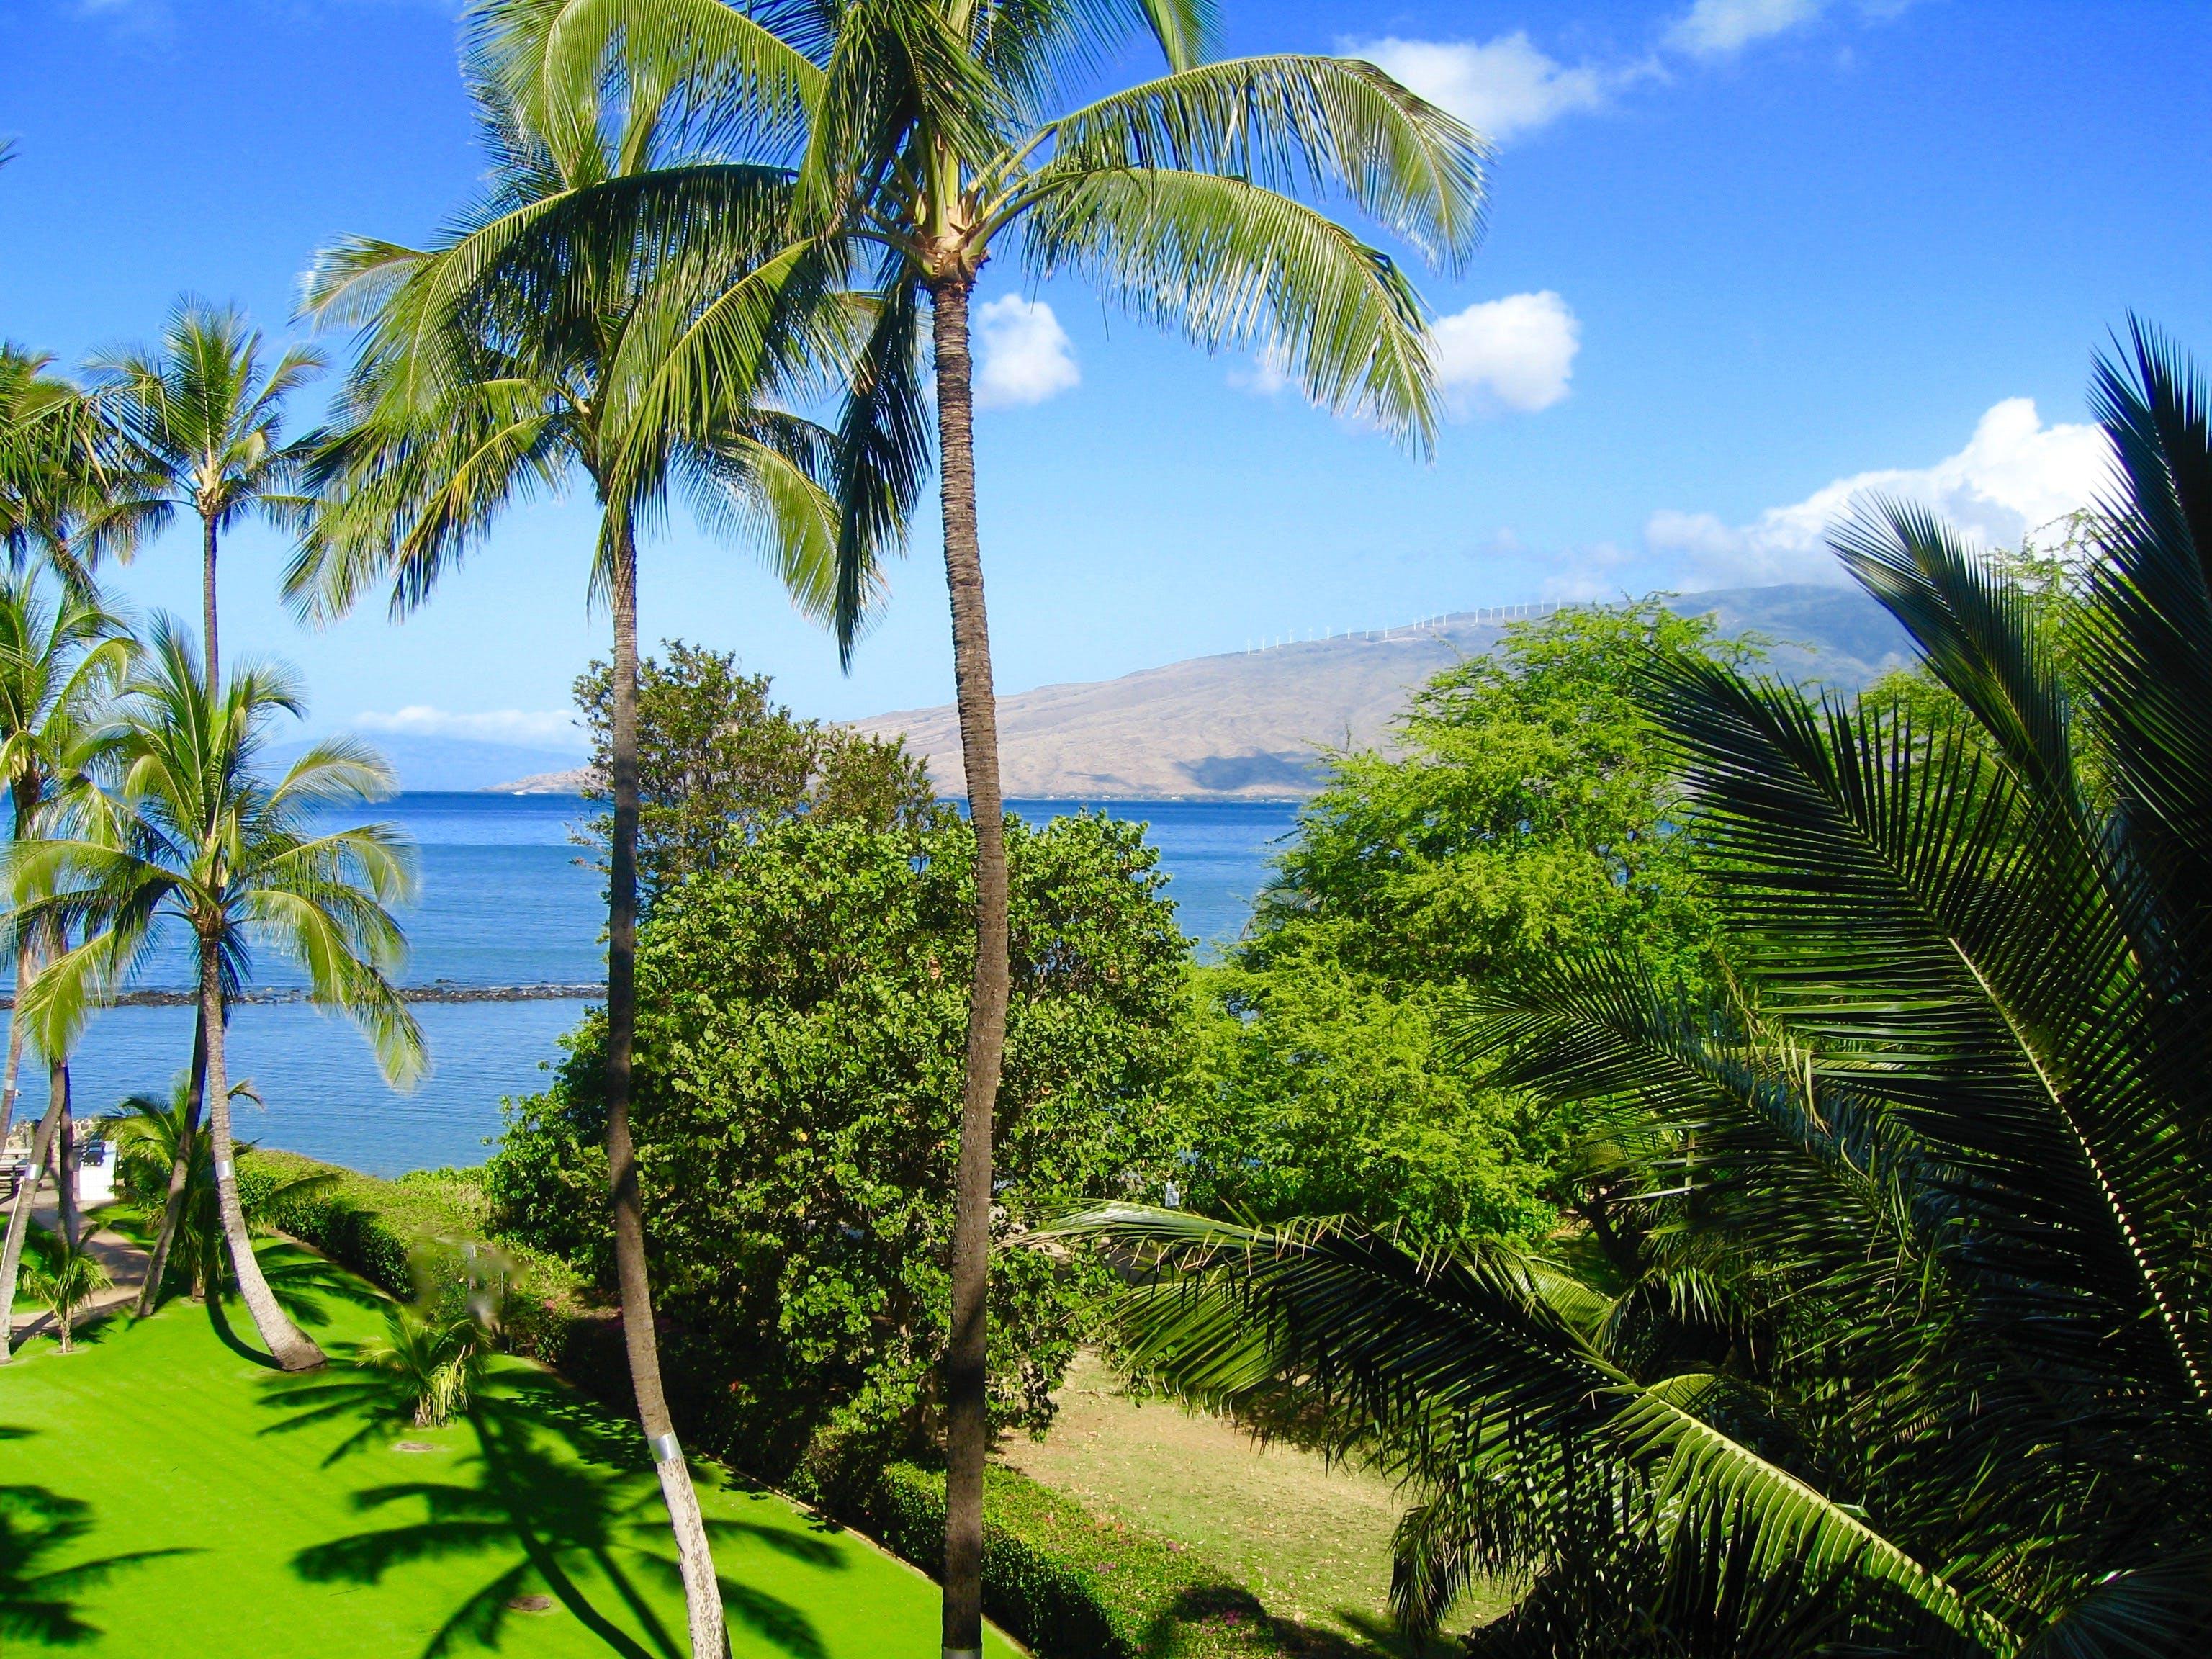 Free stock photo of Maui Hawaii Beach Palm Trees